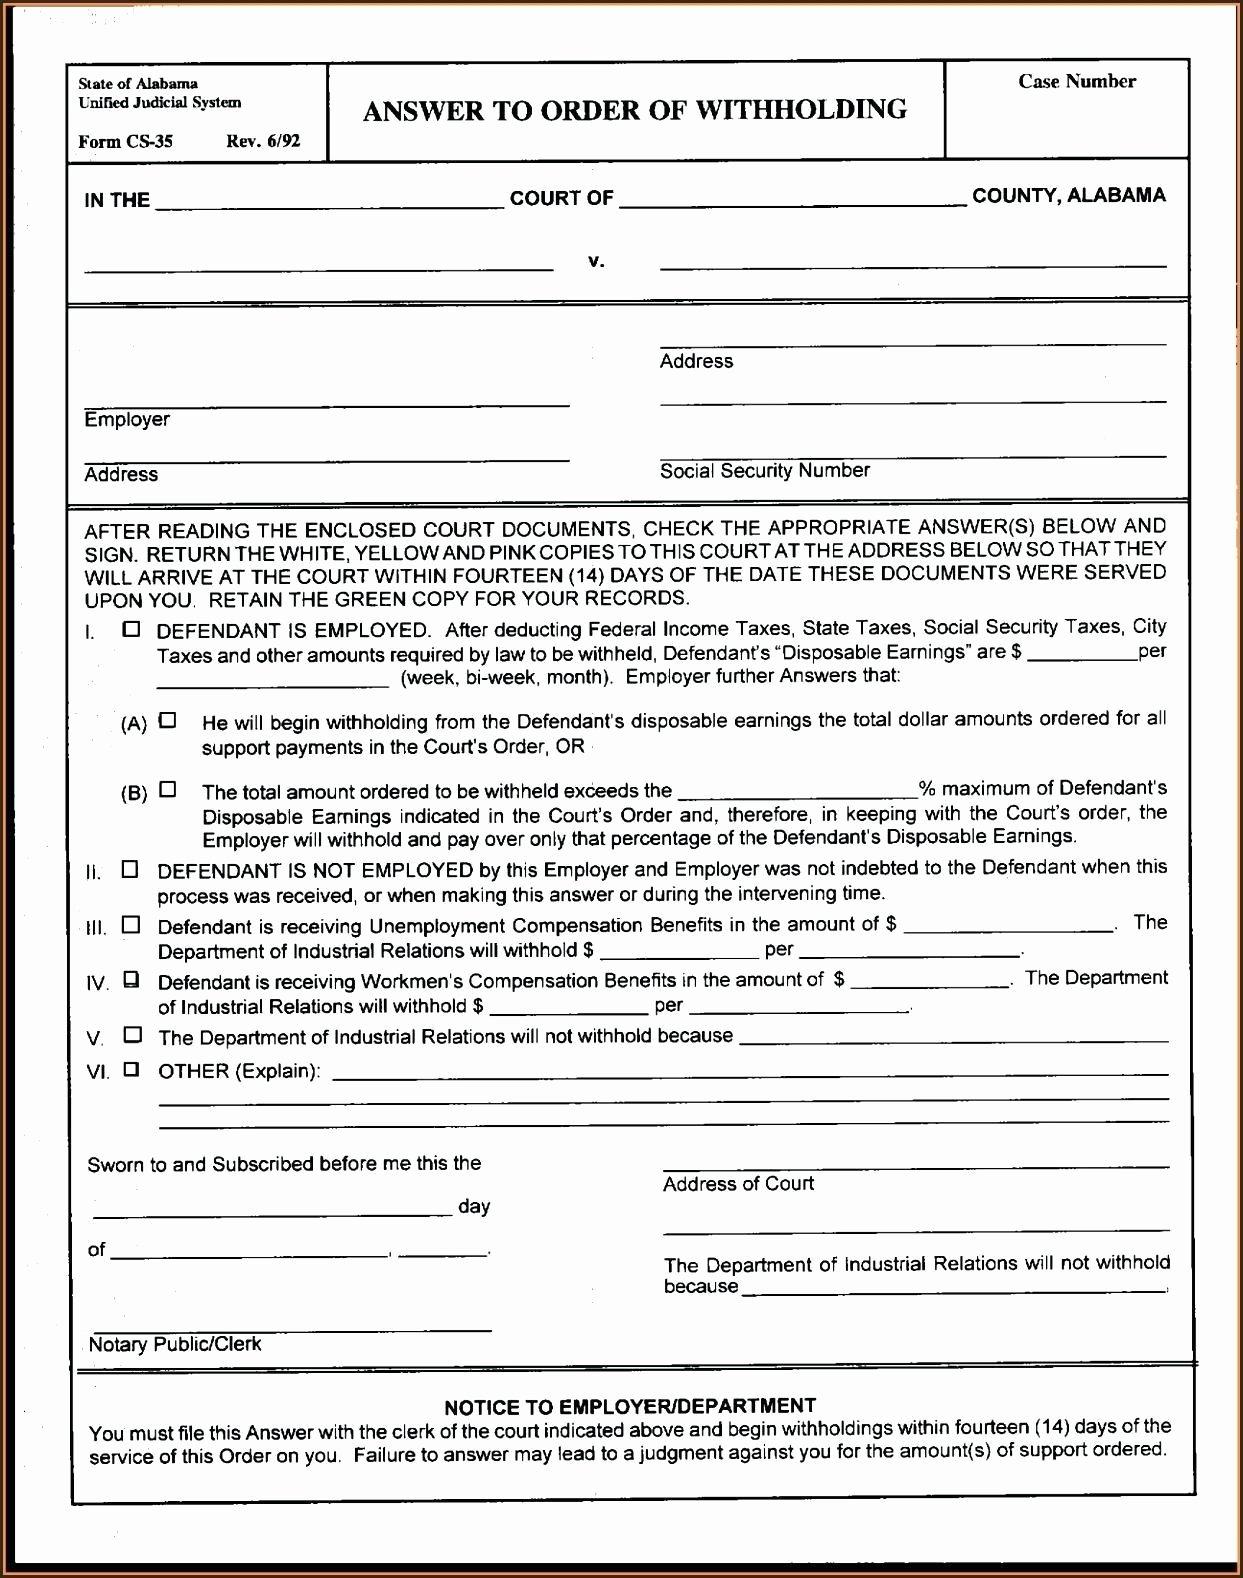 Fake Divorce Certificate Template New Fake Divorce Papers – Printable Divorce Papers